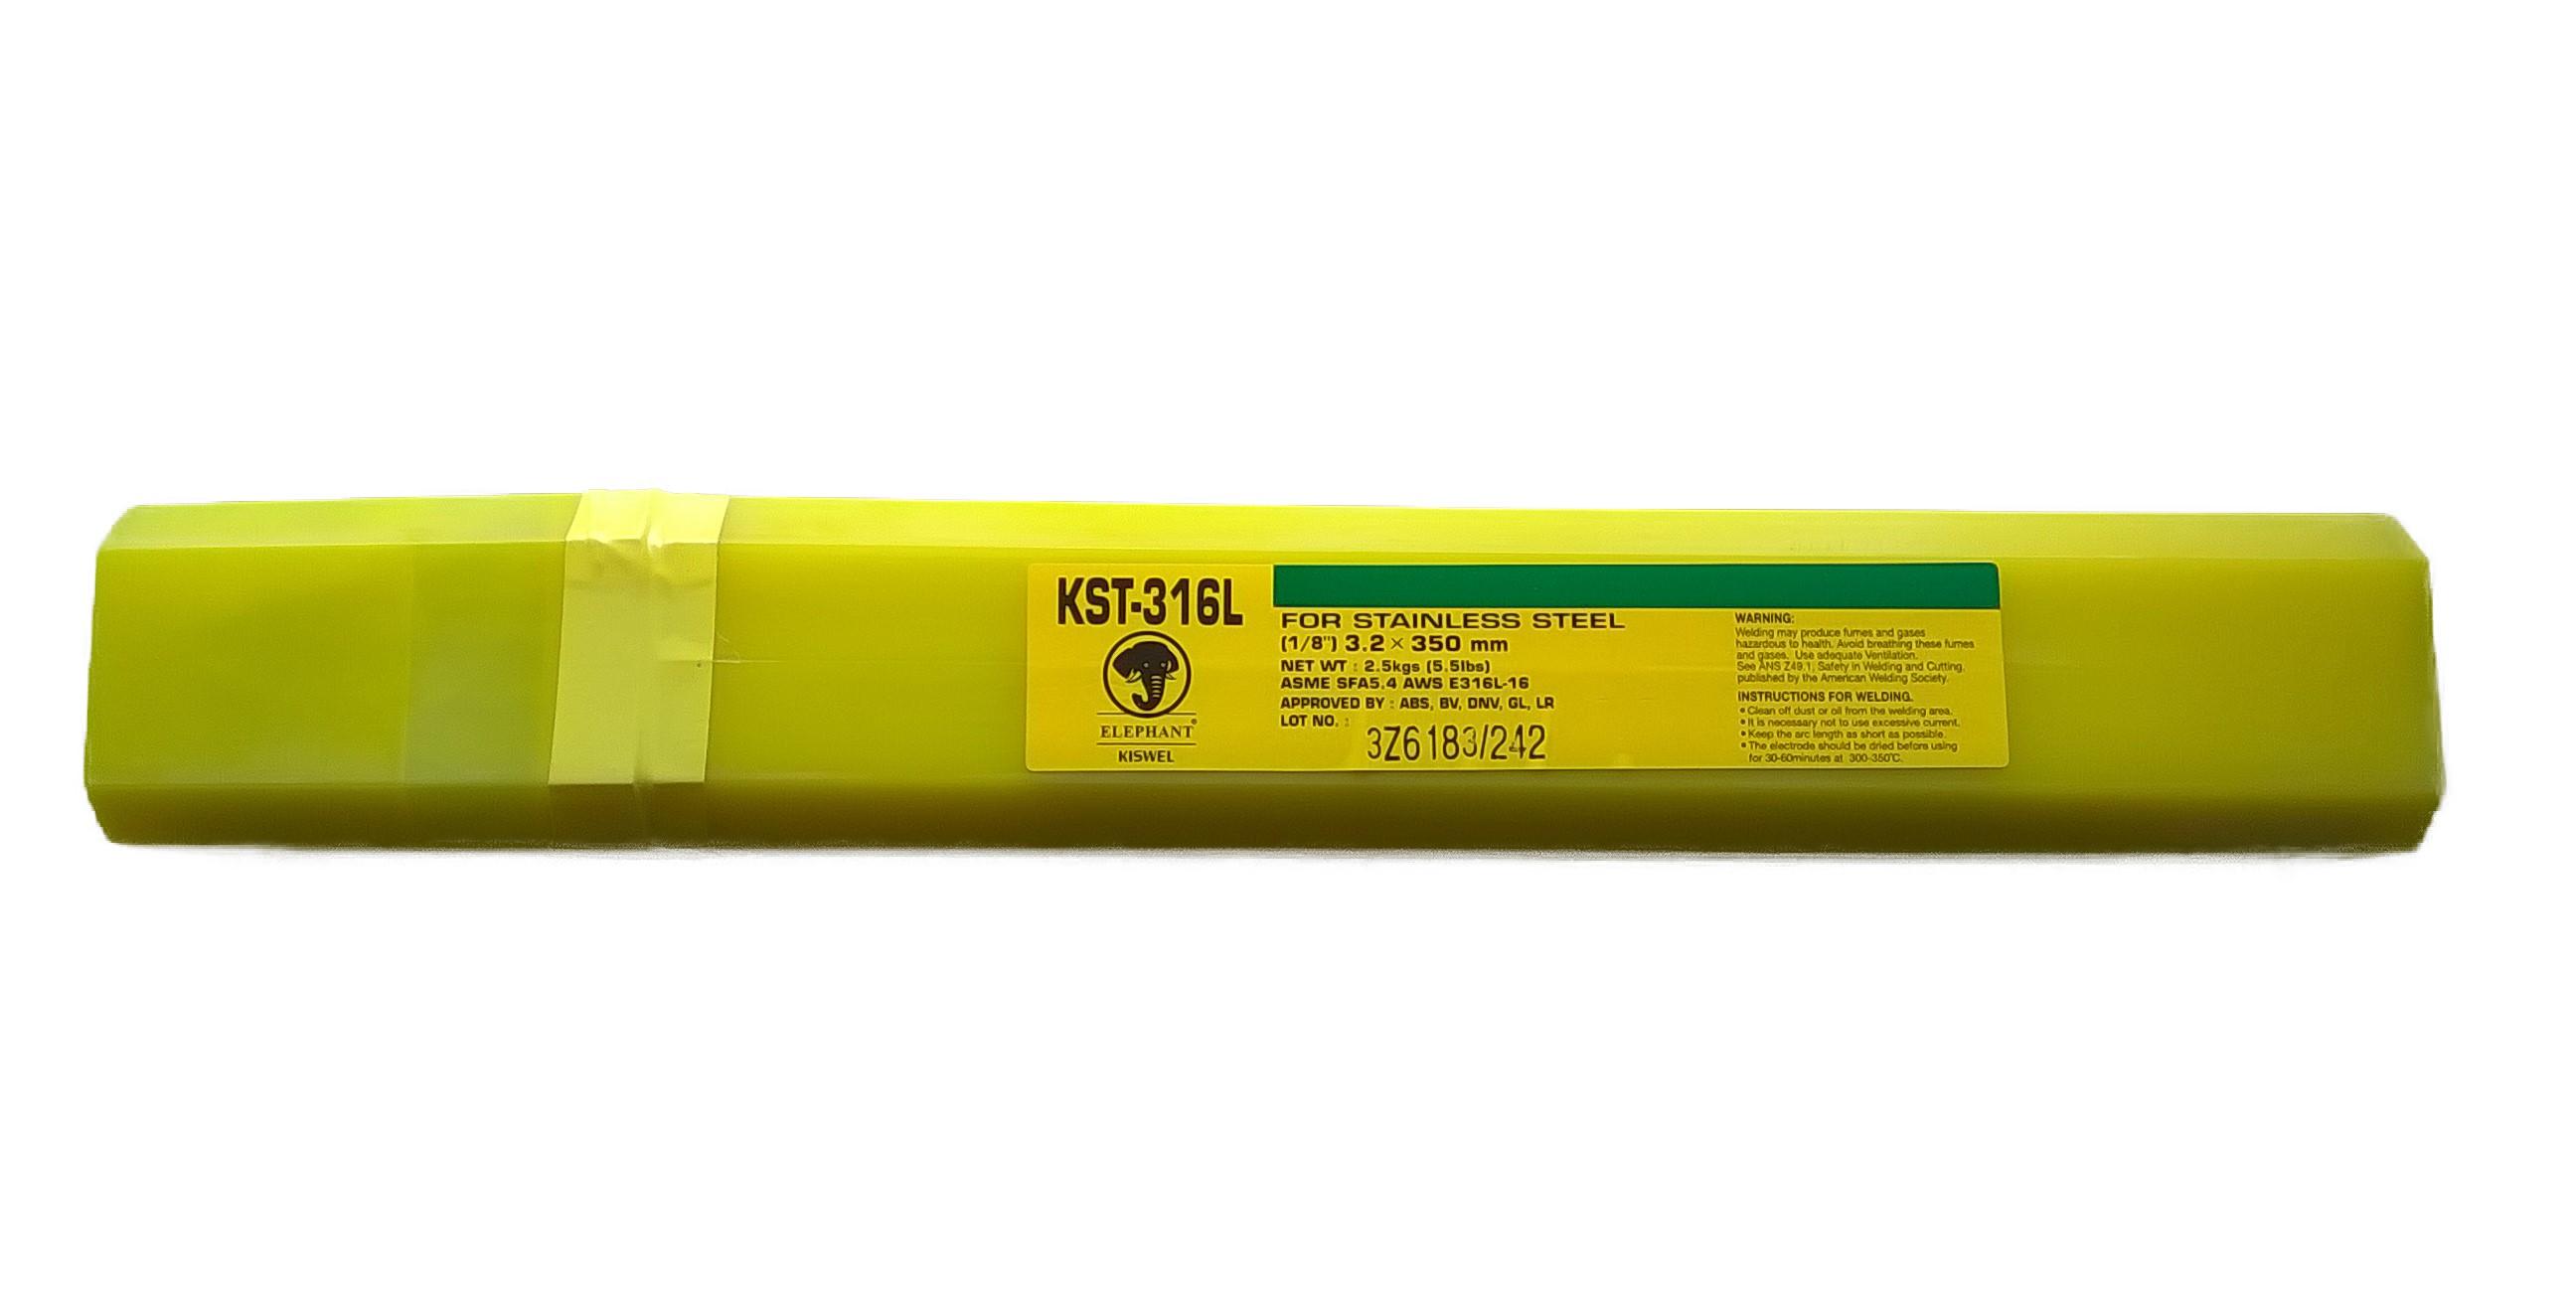 Que hàn 3.2mm KST-316L - 3.2 x 350mm Kiswel